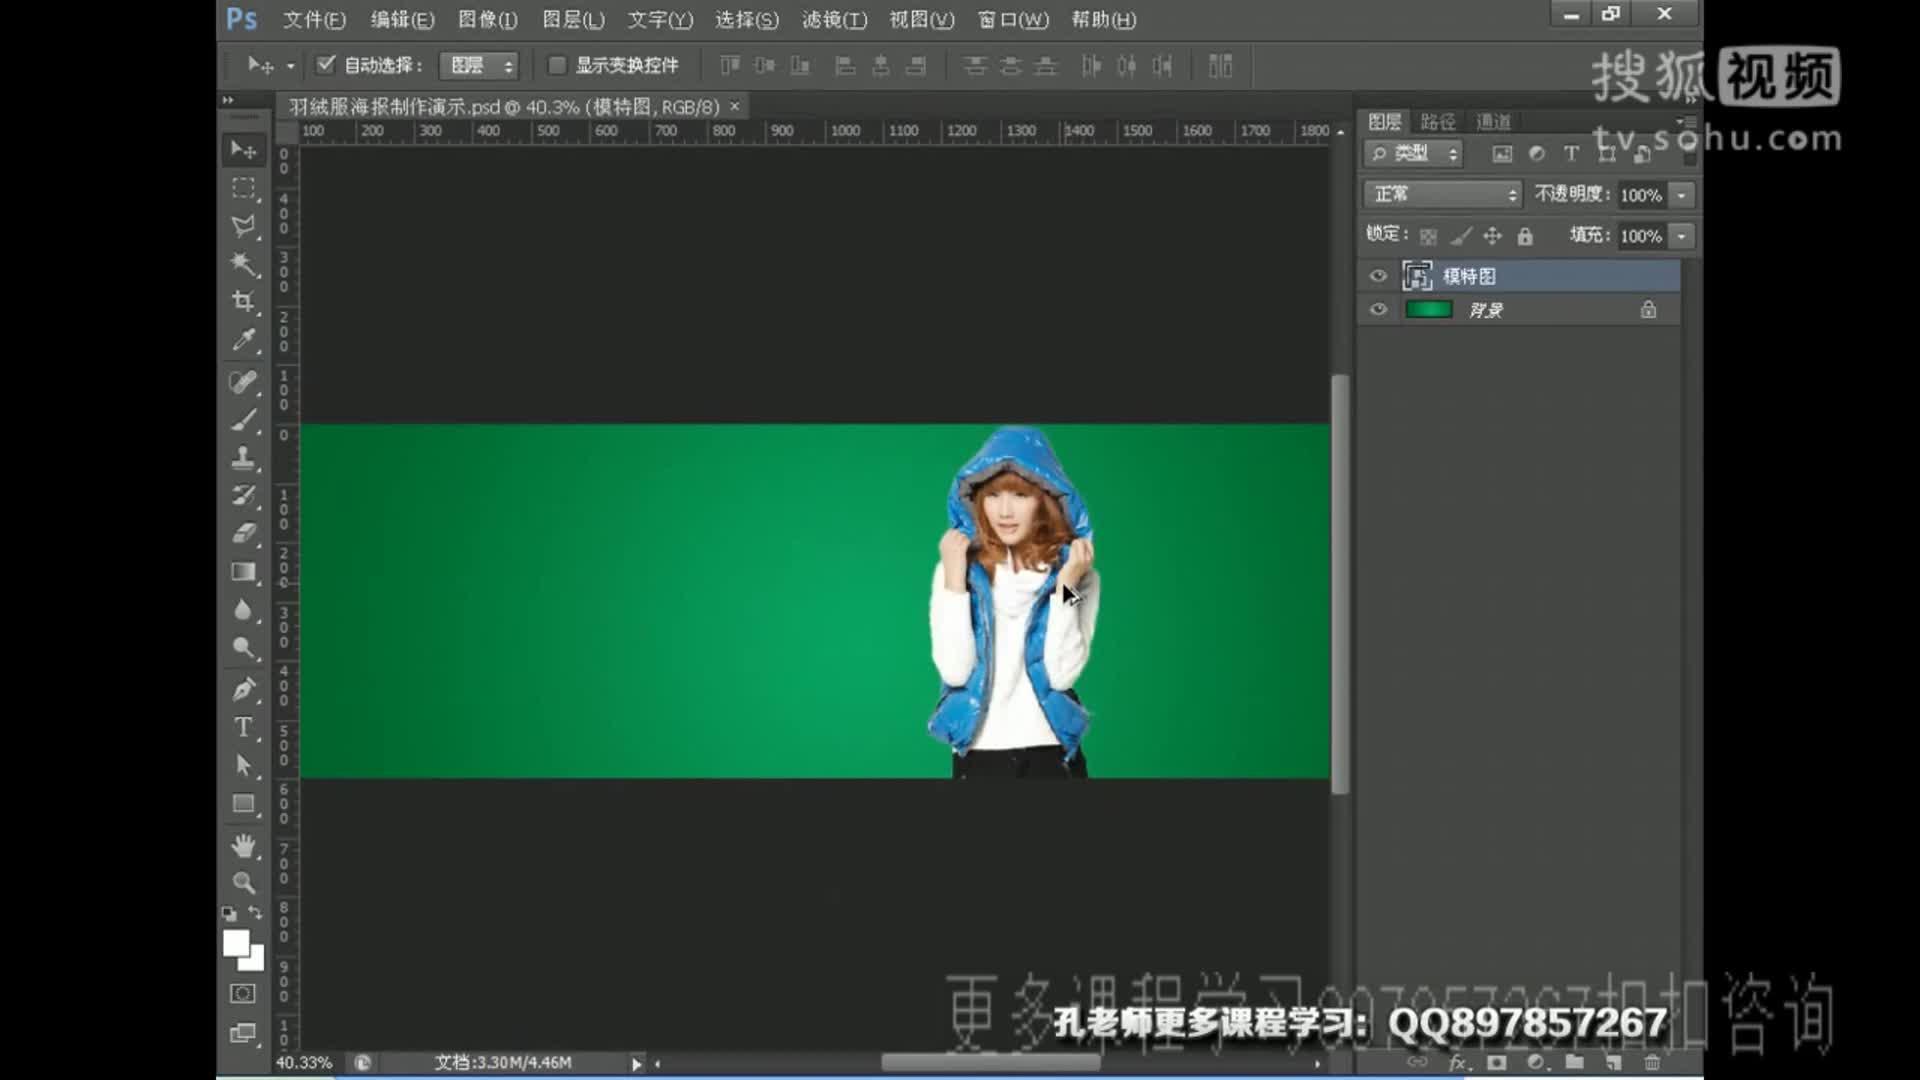 ps海报制作 淘宝美工教程photoshop教程 羽绒服海报制作 全屏首焦图